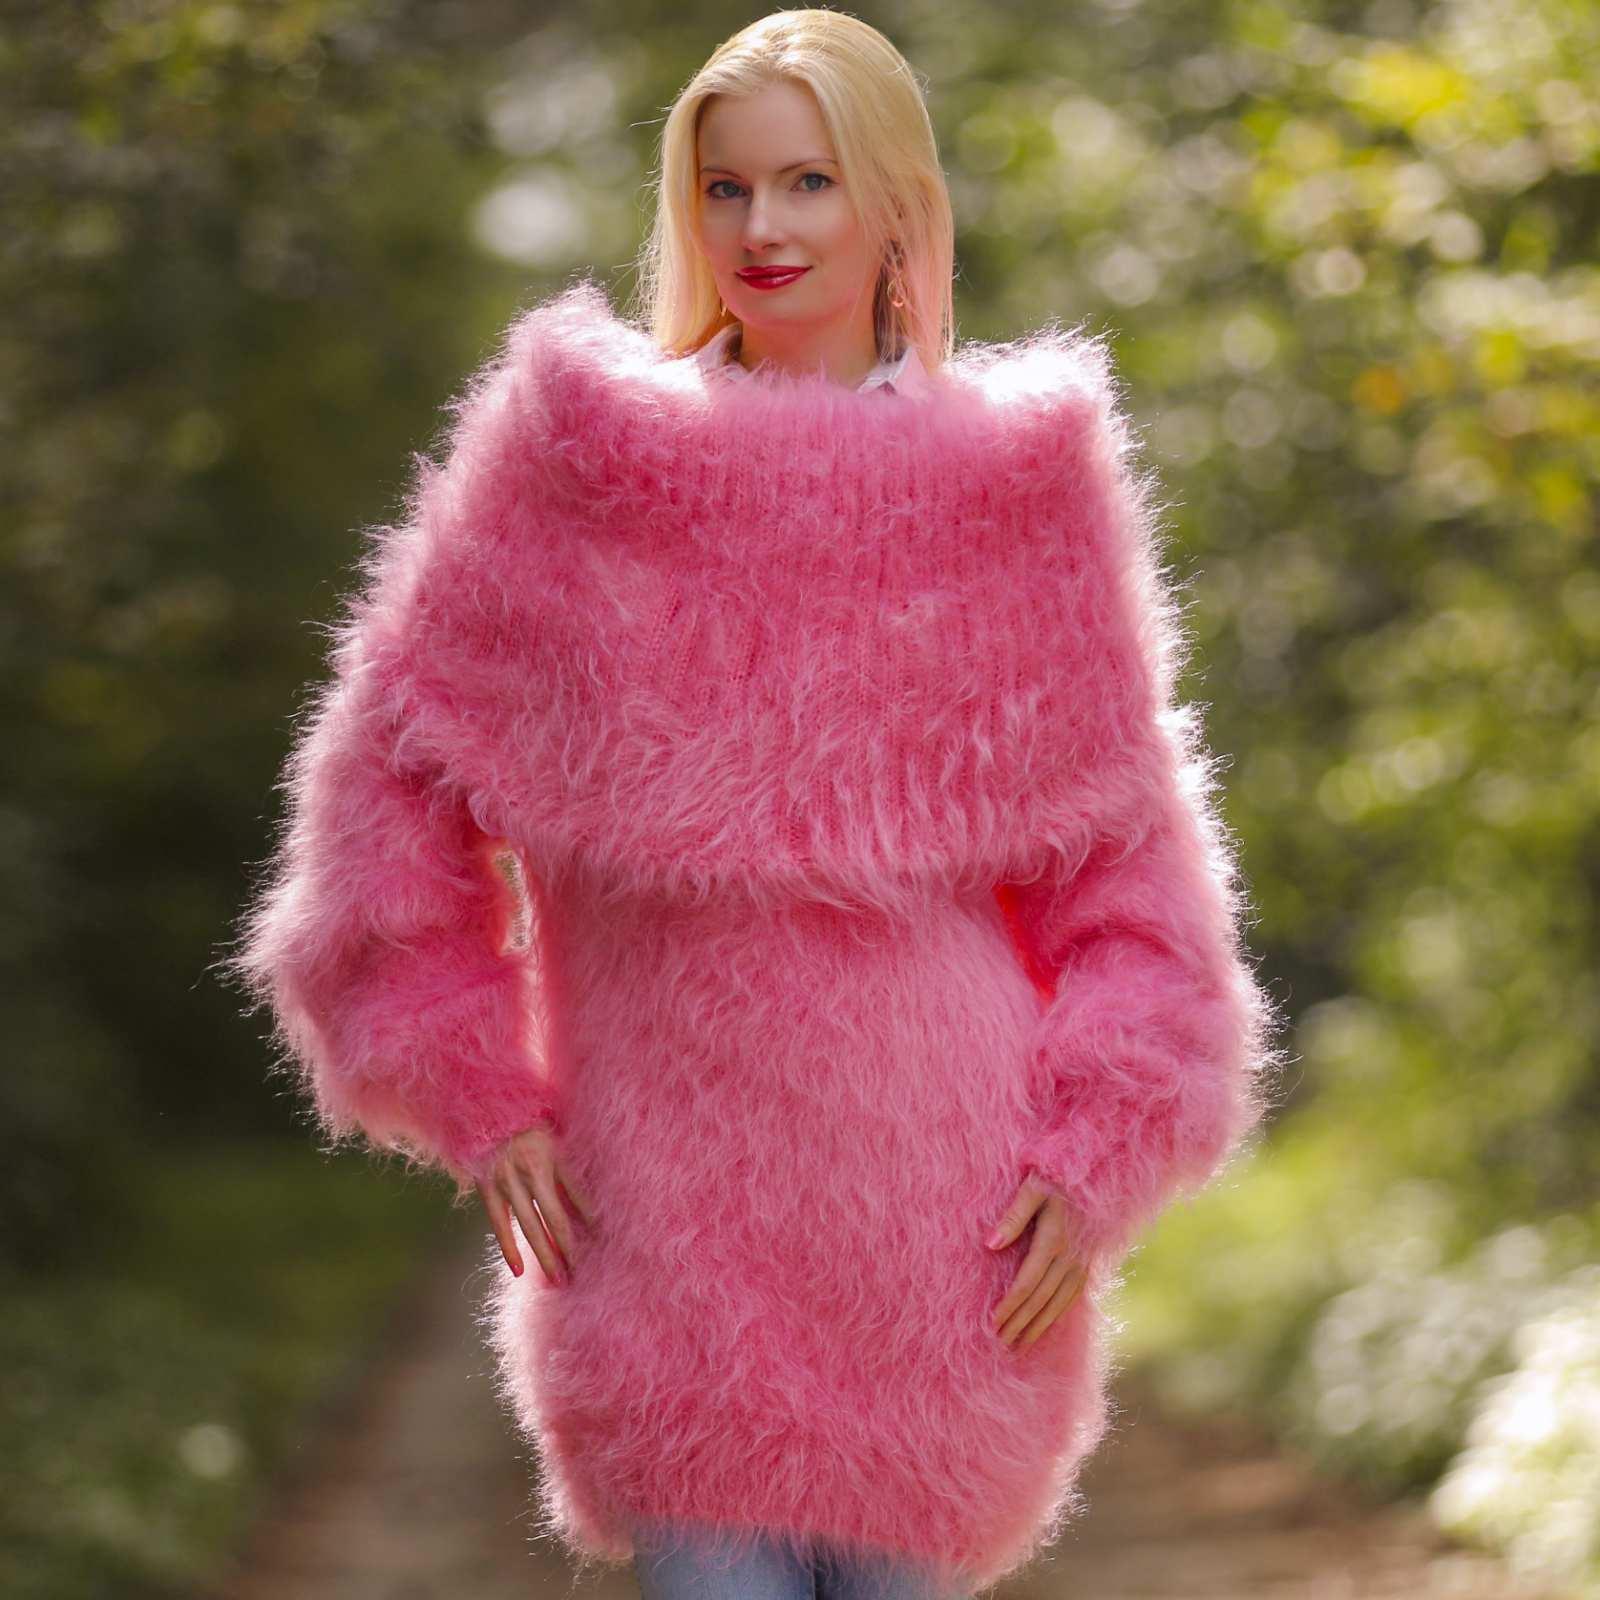 pink mohair sweater 119 ynykdmm